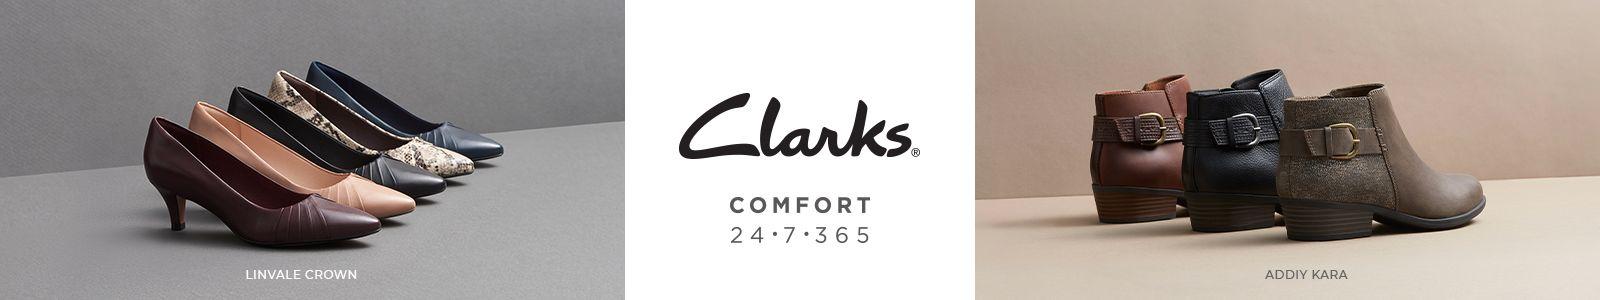 Clarks, Comfort, 24.7.365, Linvale Crown, Addiy Kara